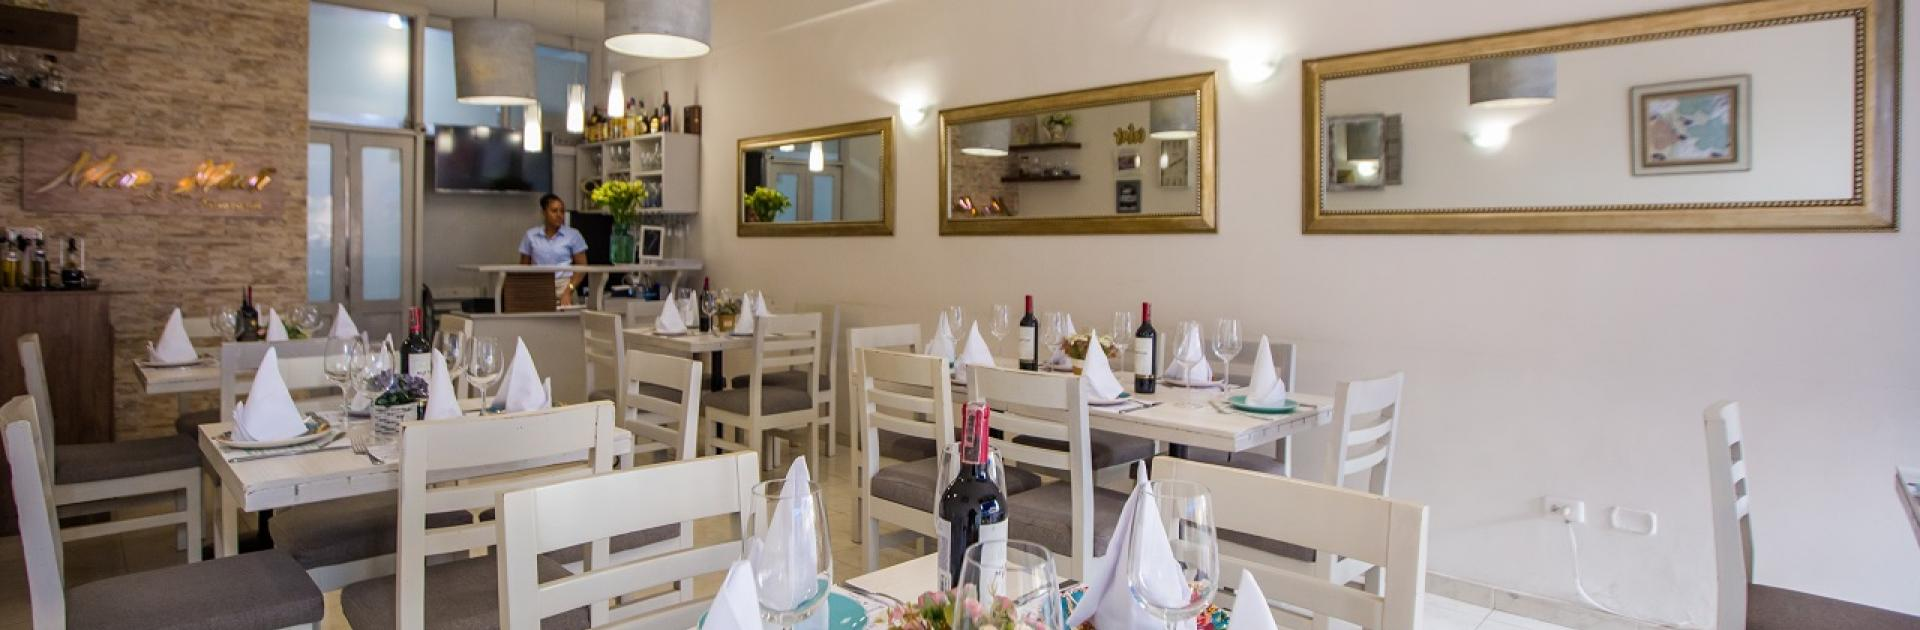 Restaurante Mare e Monti, participante de Dónde Restaurant Week 2019 en Cartagena de Indias